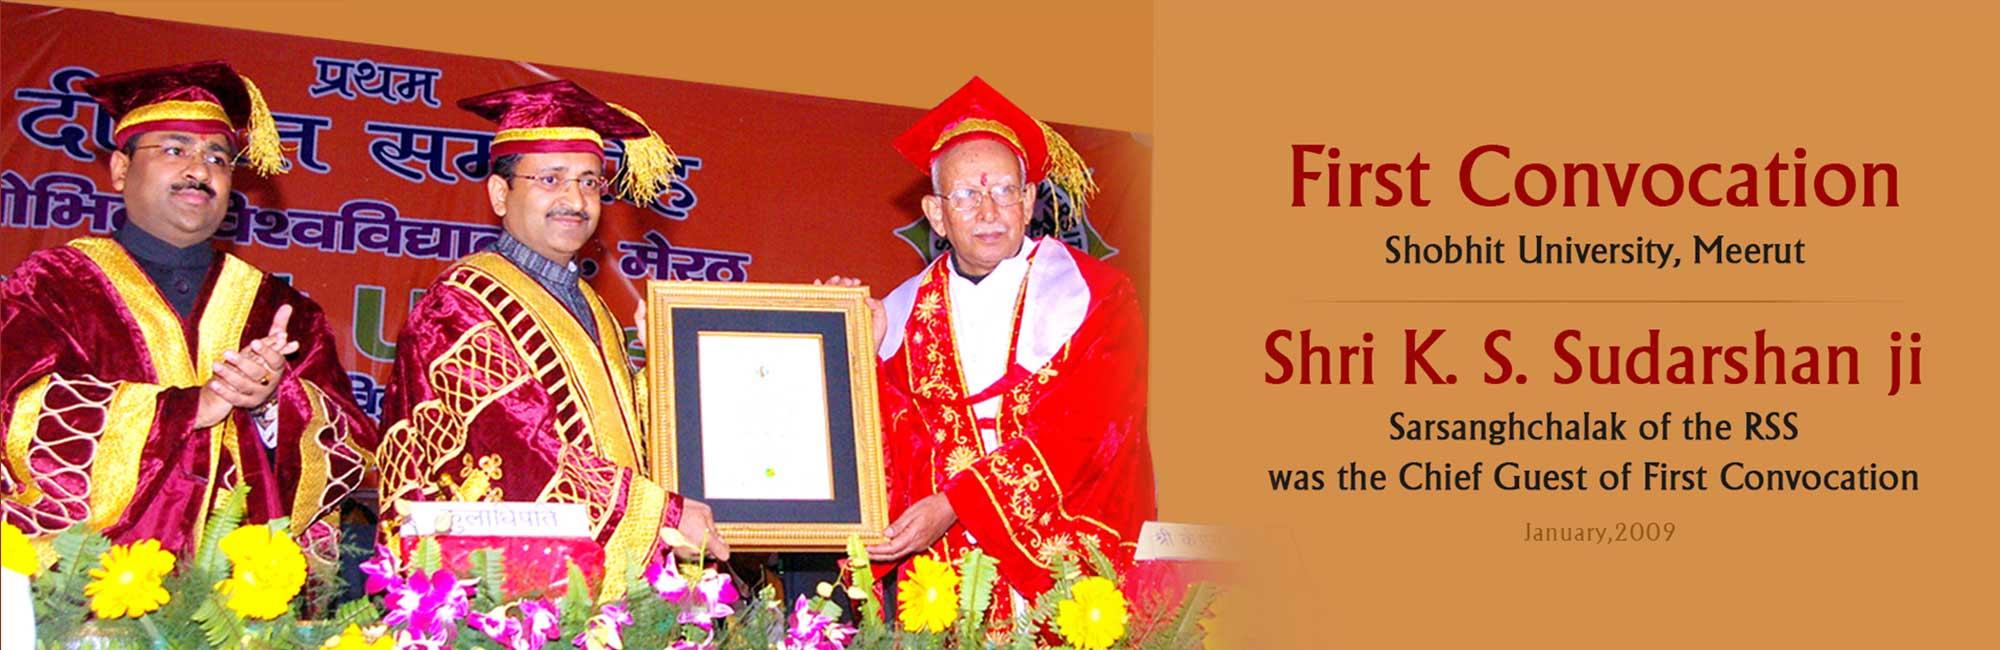 Shobhit University Banner